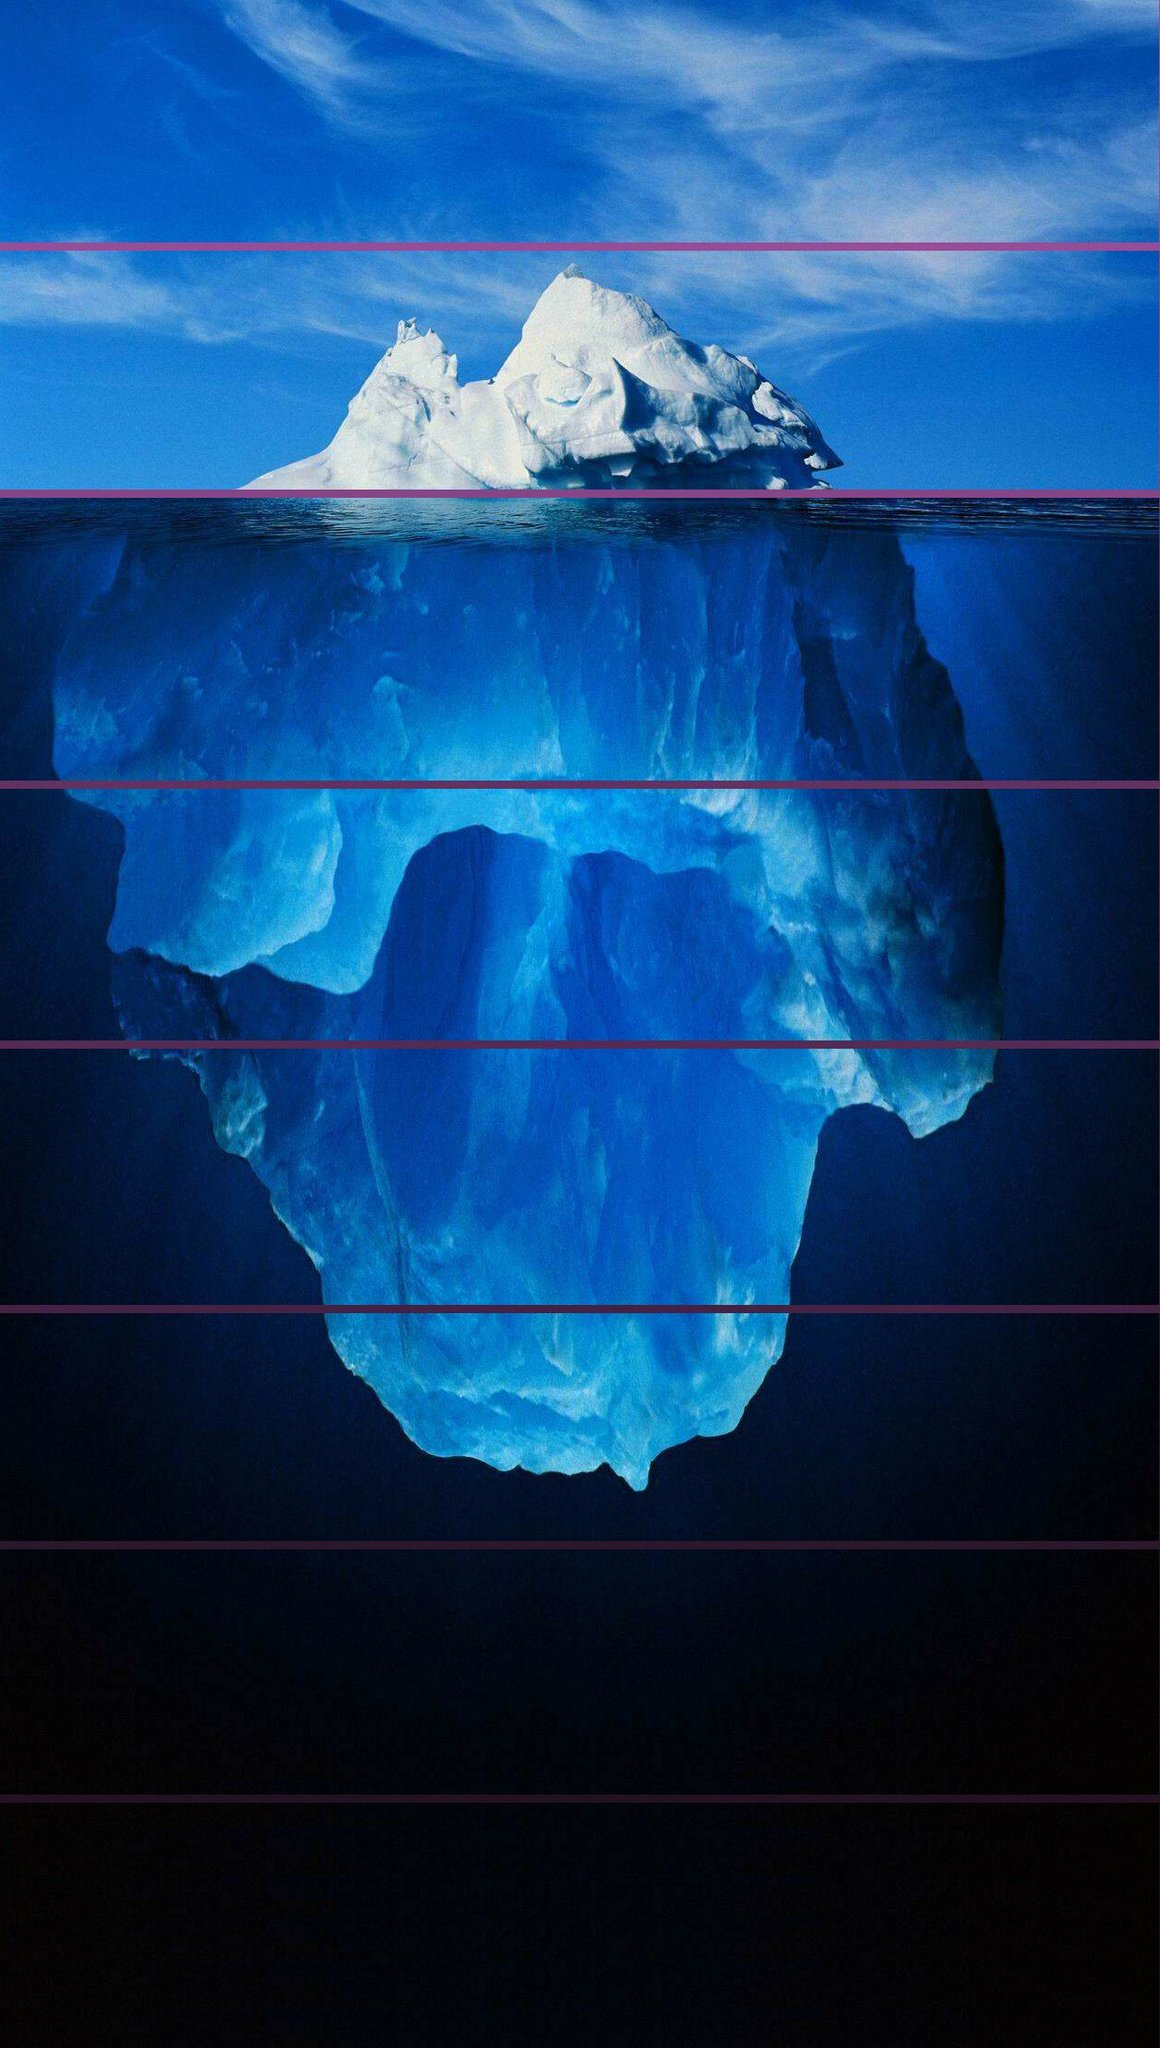 Plantilla gratis para hacer un iceberg - meme